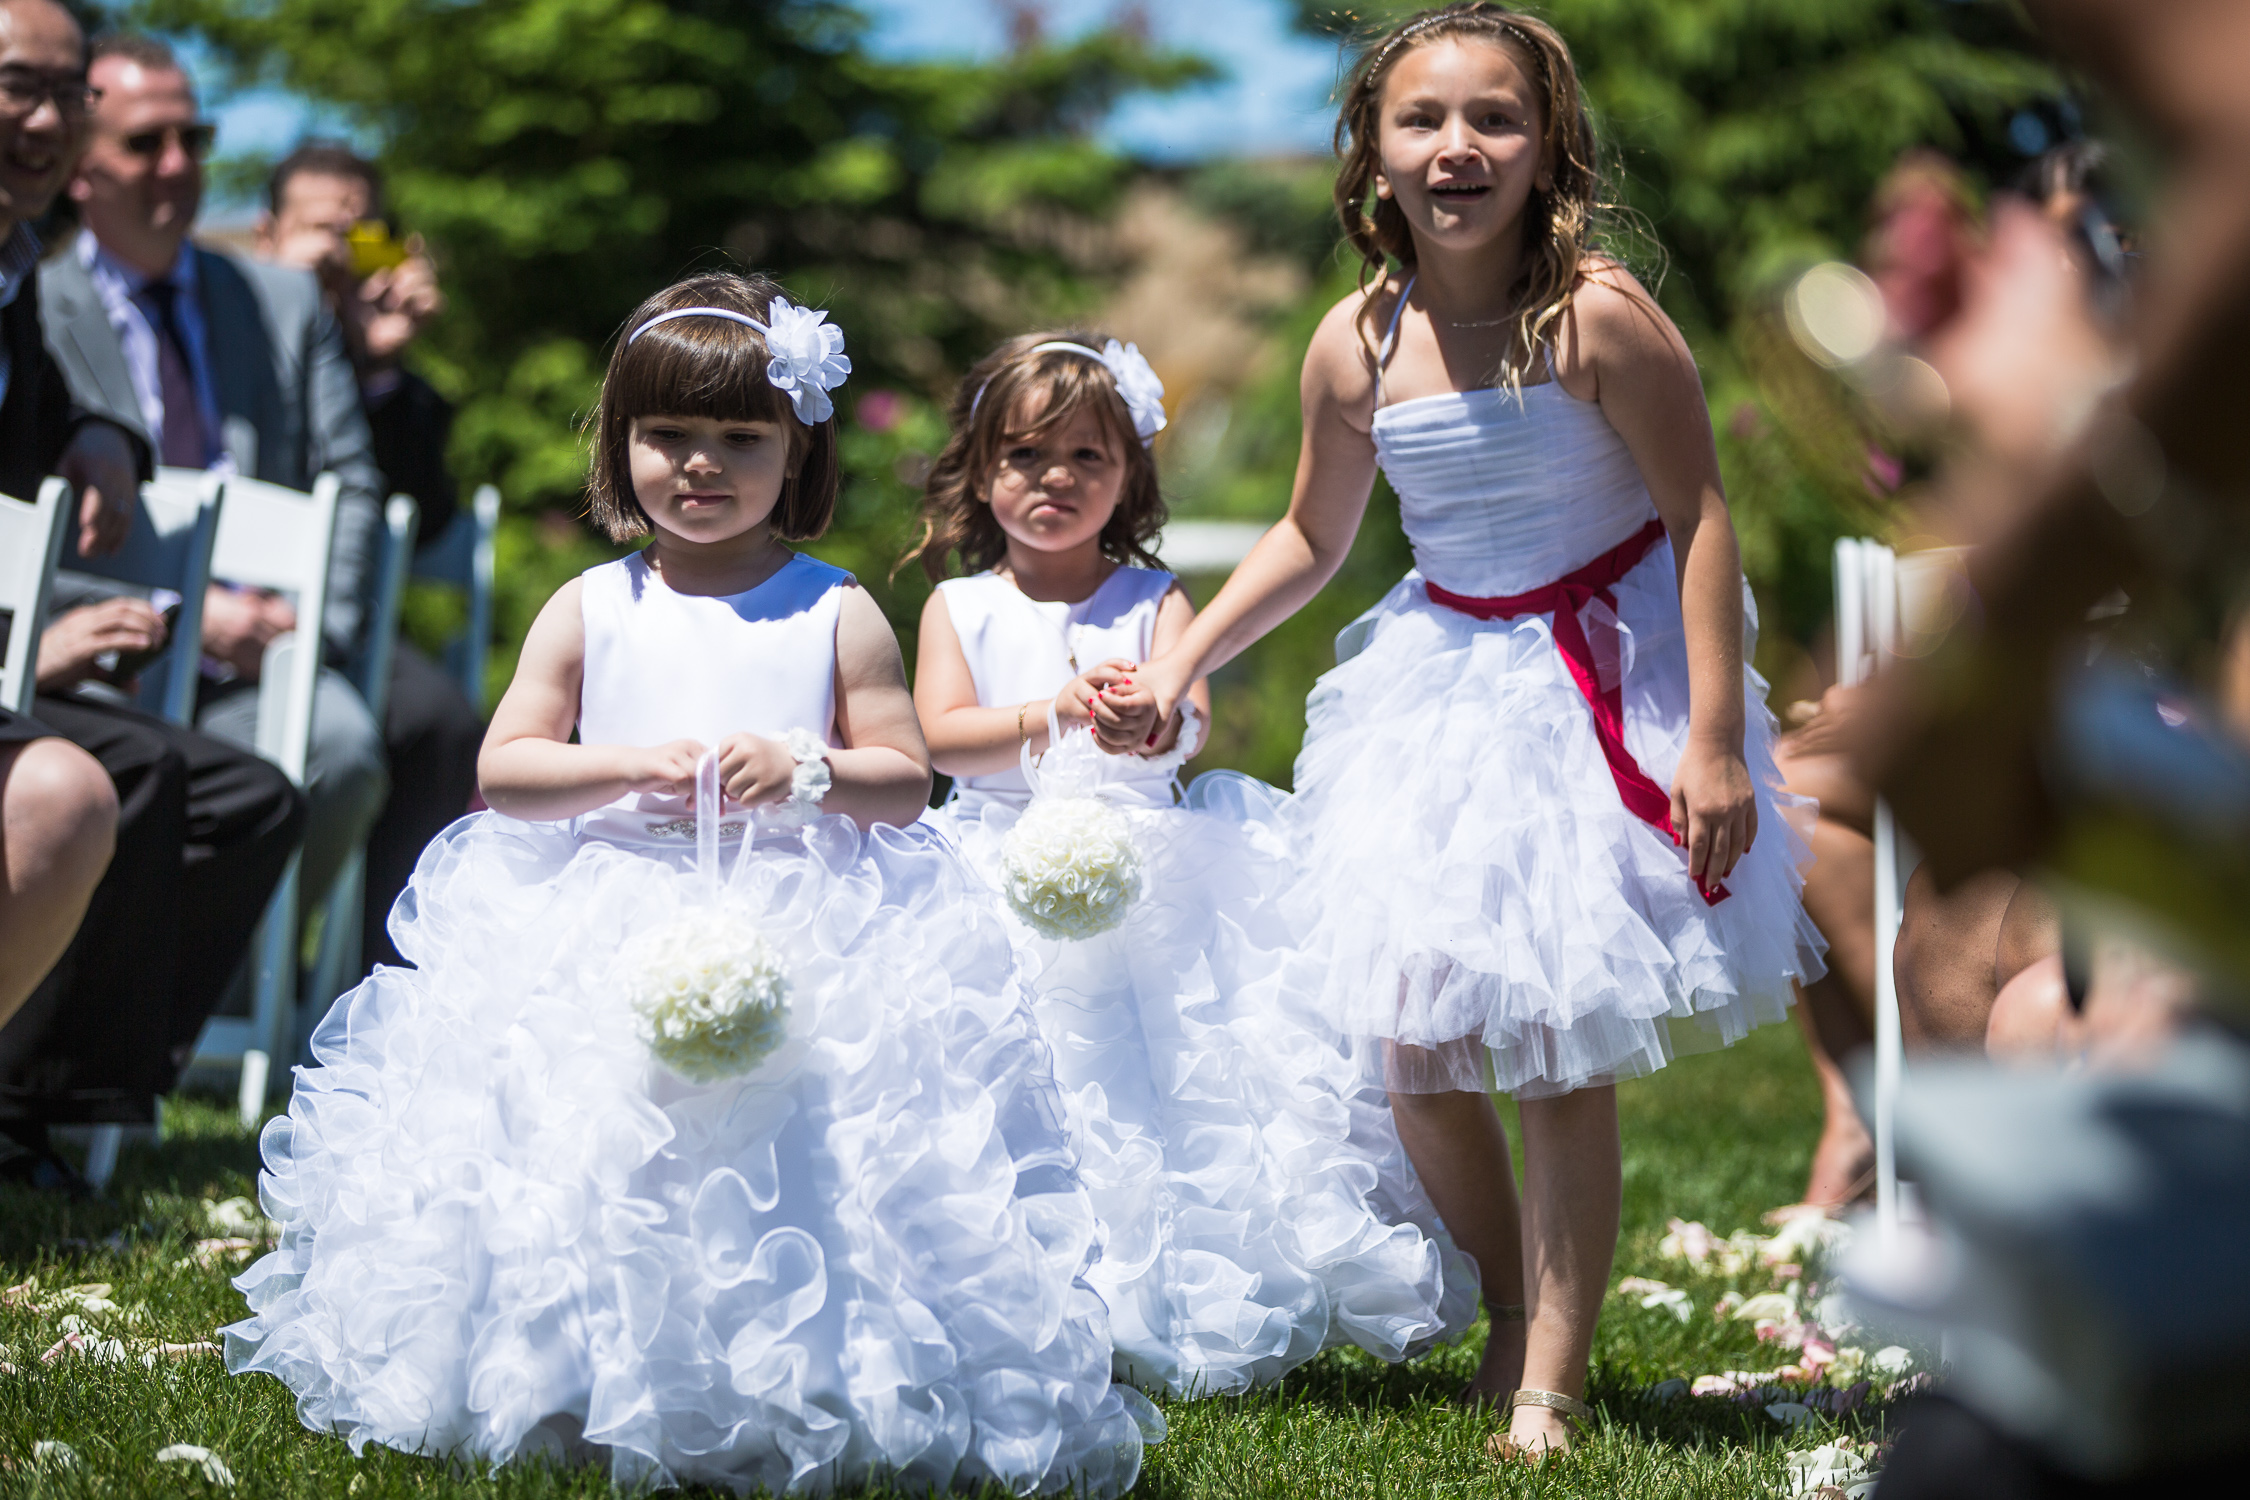 Paradise-Banquet-Hall-Wedding-Vaughan-Ontario-0031.jpg